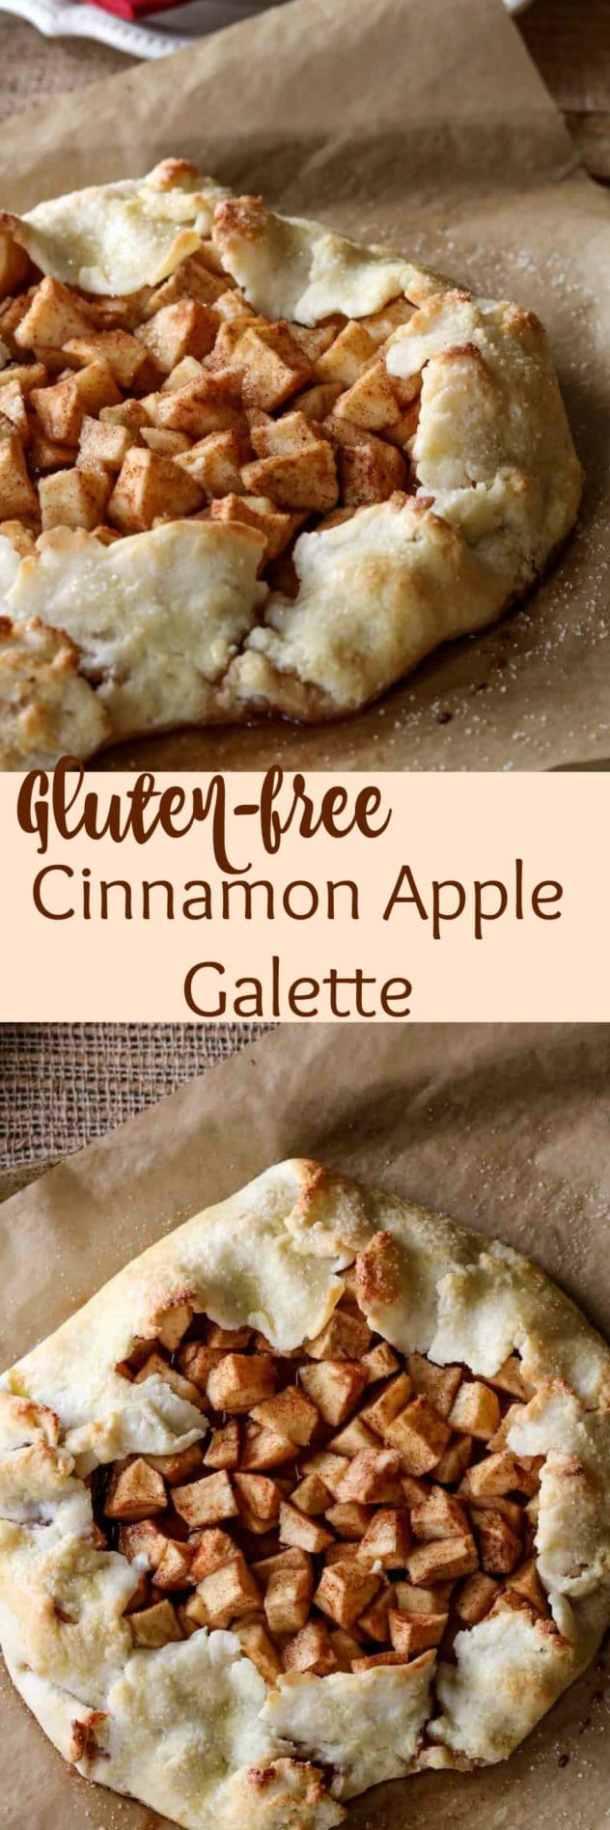 Gluten-free-cinnamon-apple-galette